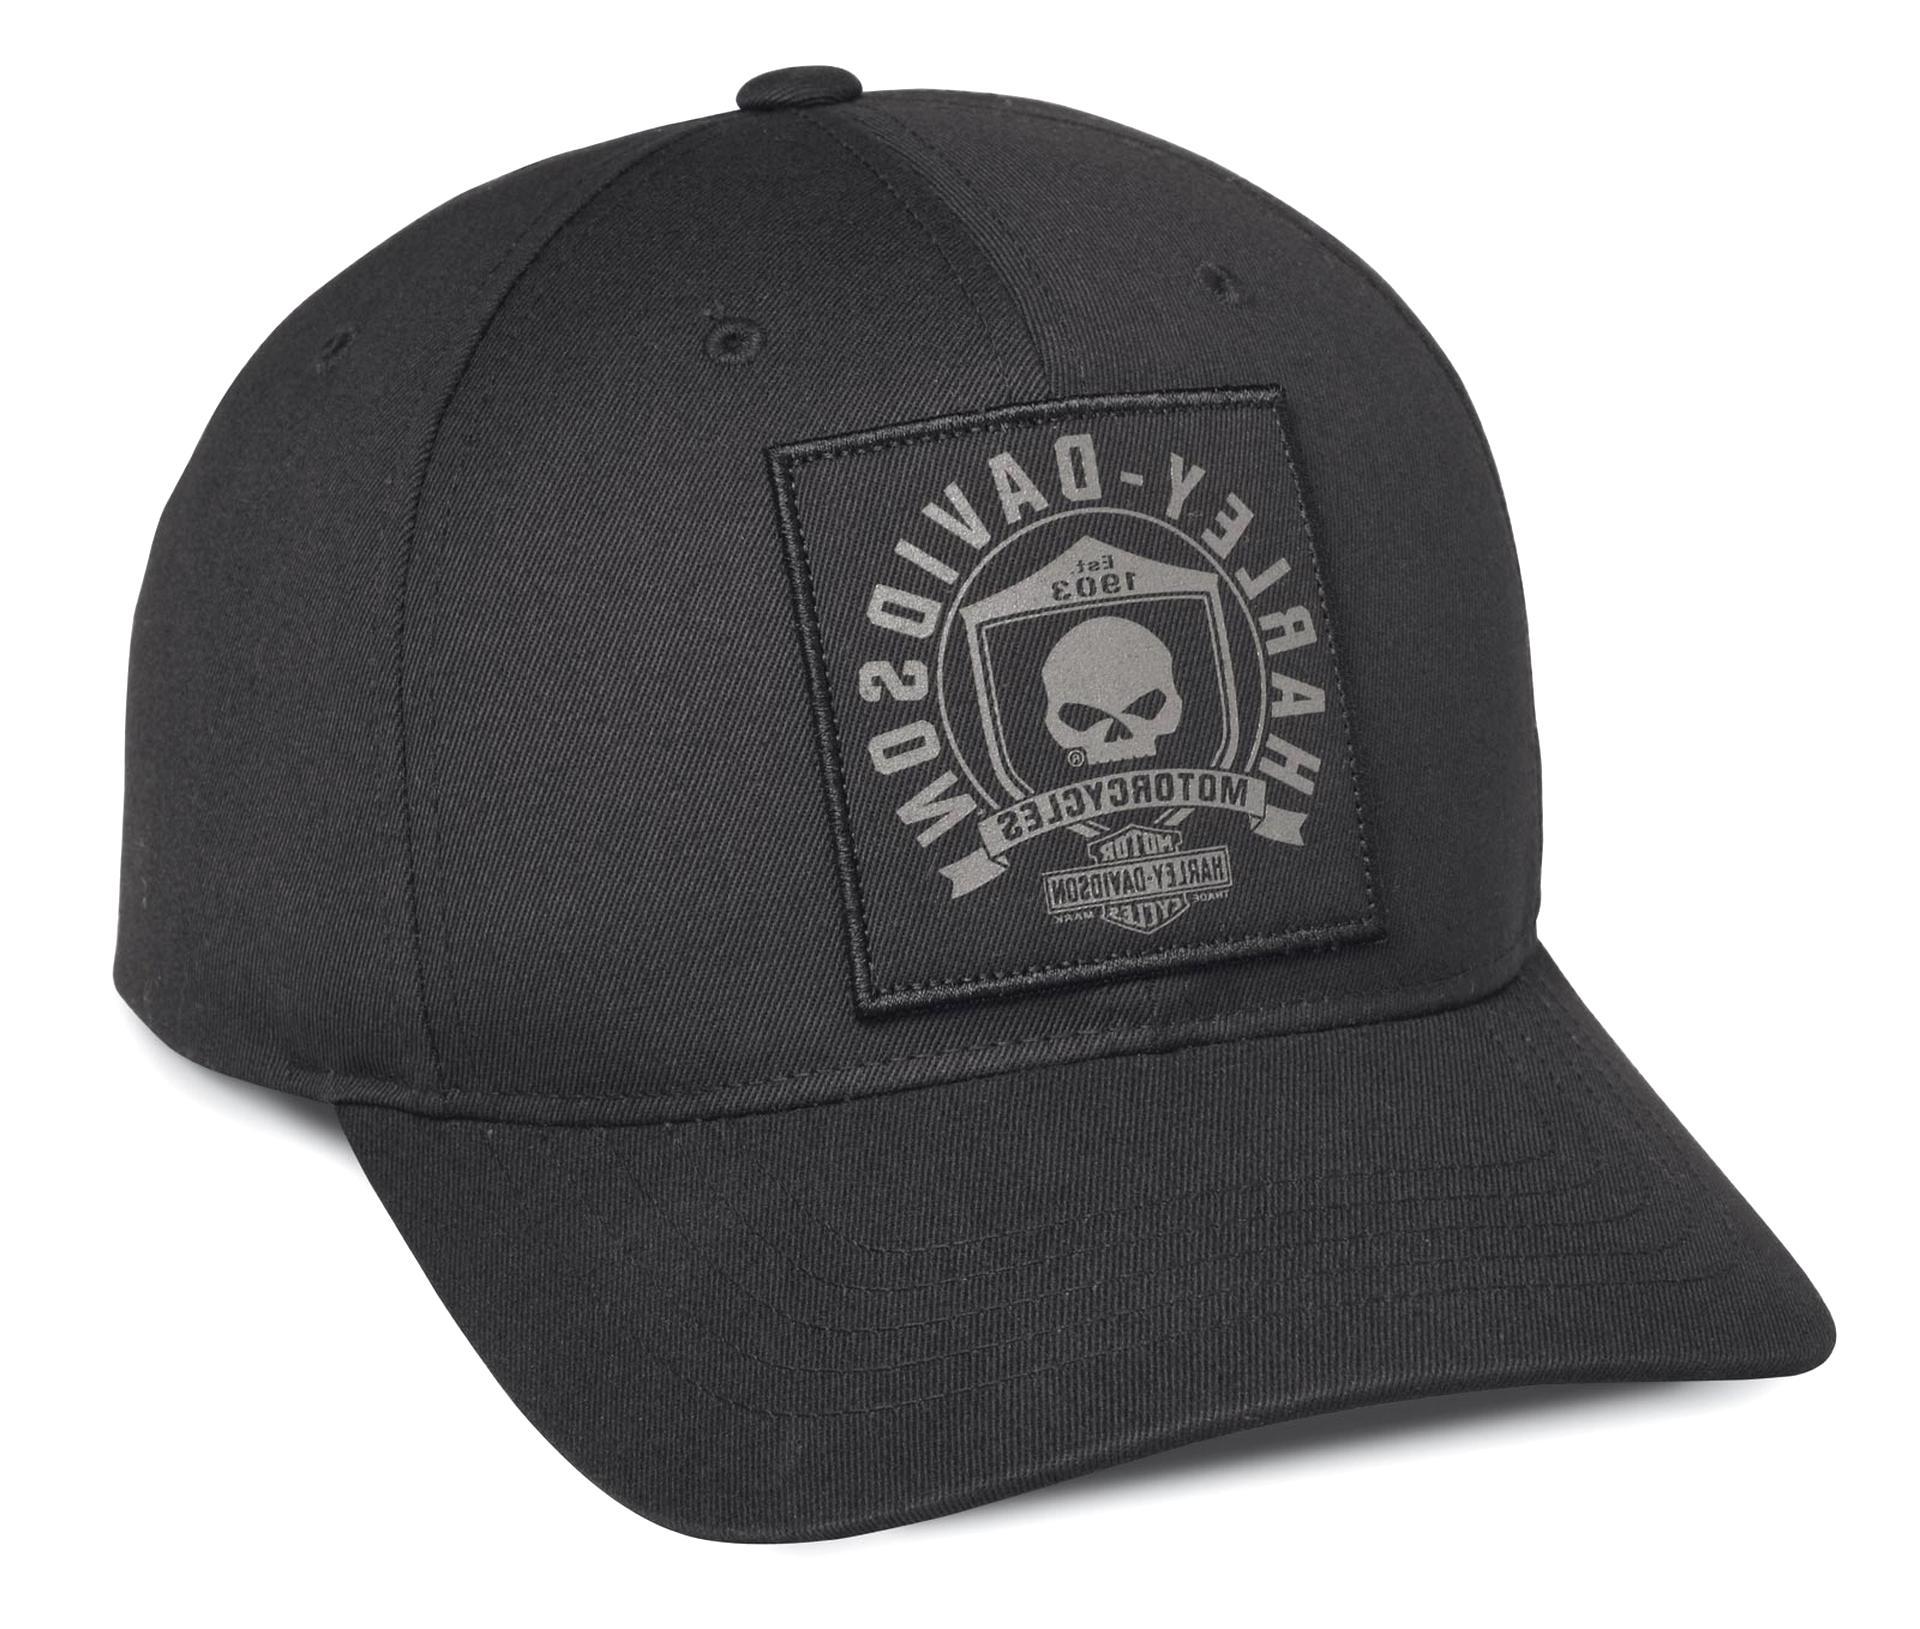 HD Cap Phantom schwarz Baseball Cap Schirmmütze Cappy Mütze Harley Davidson